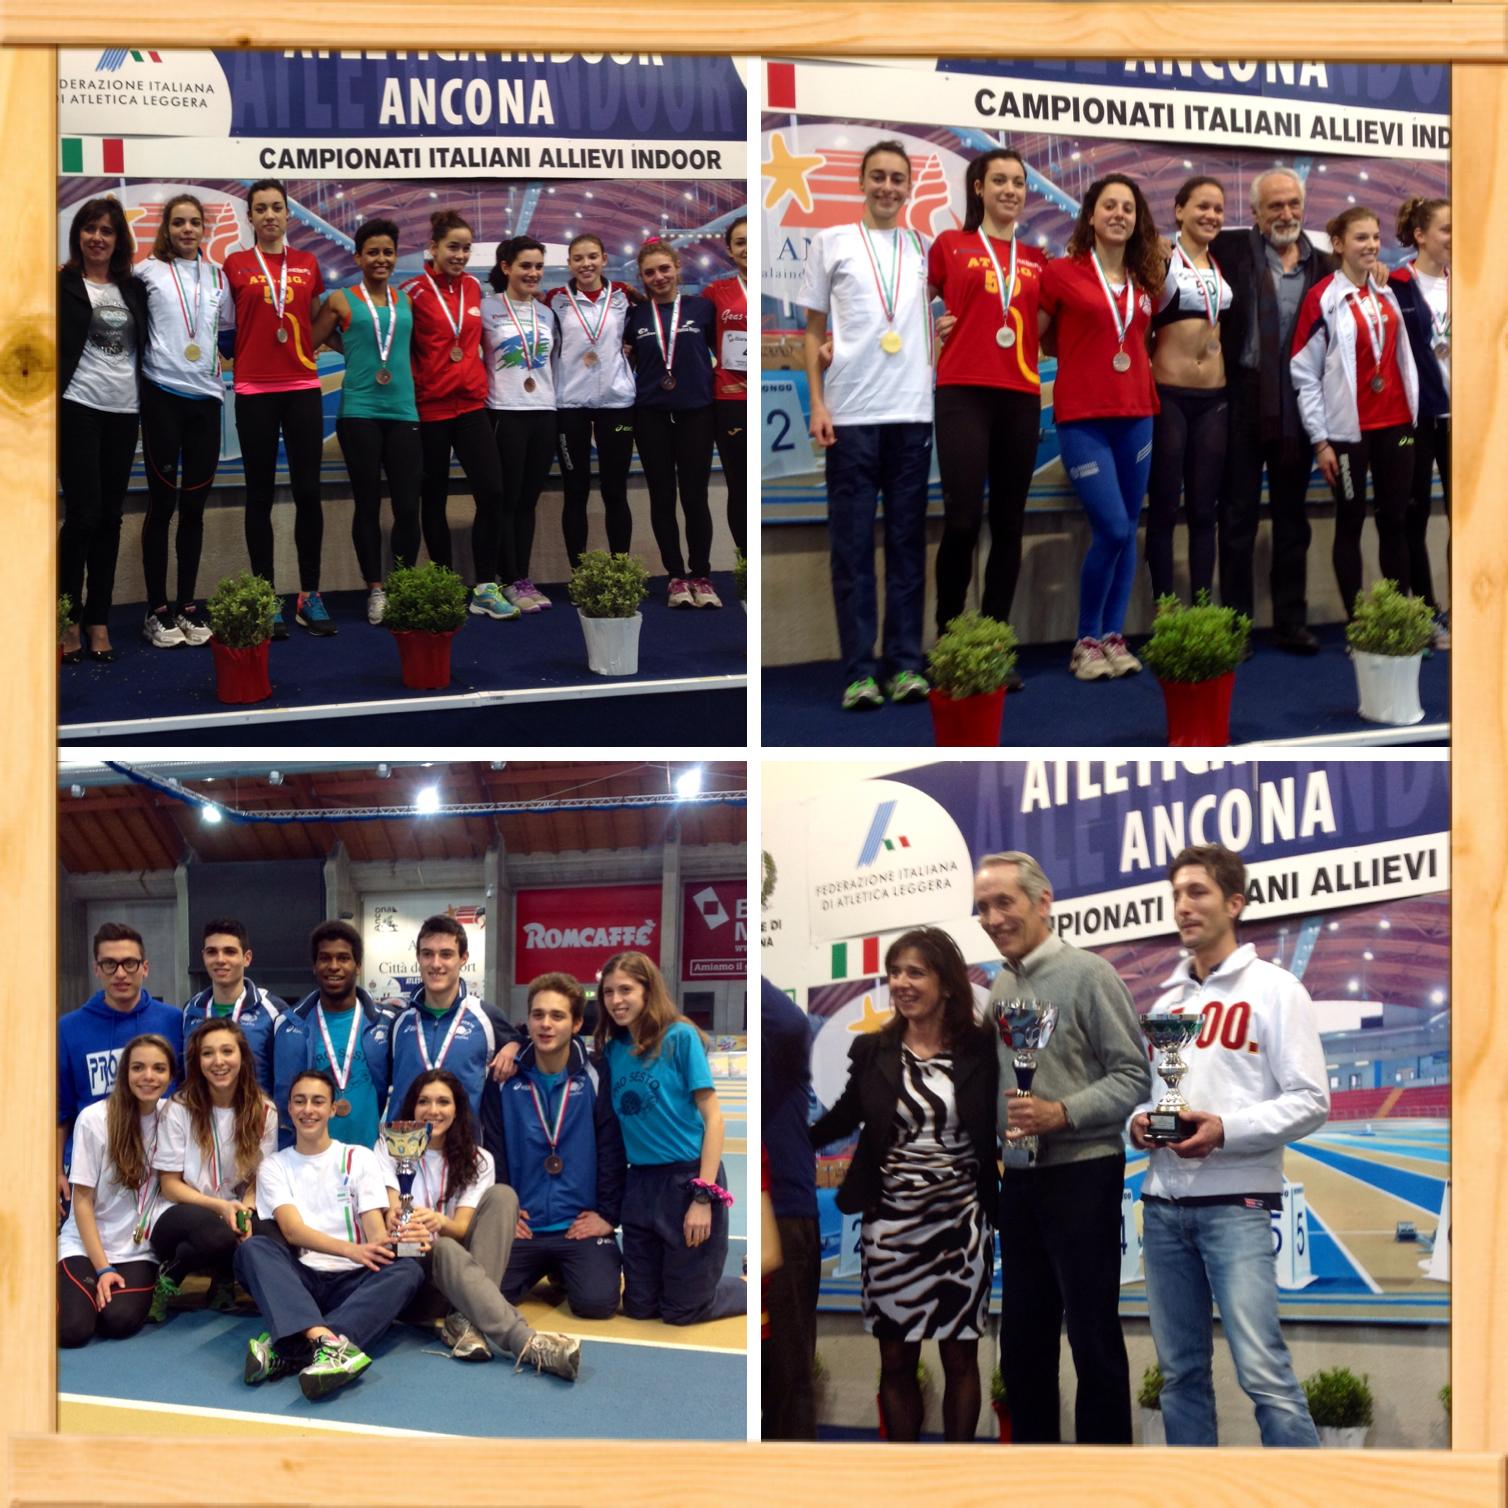 Campionati Italiani Indoor Allievi/e – Ancona 15-16 Febbraio 2014 –